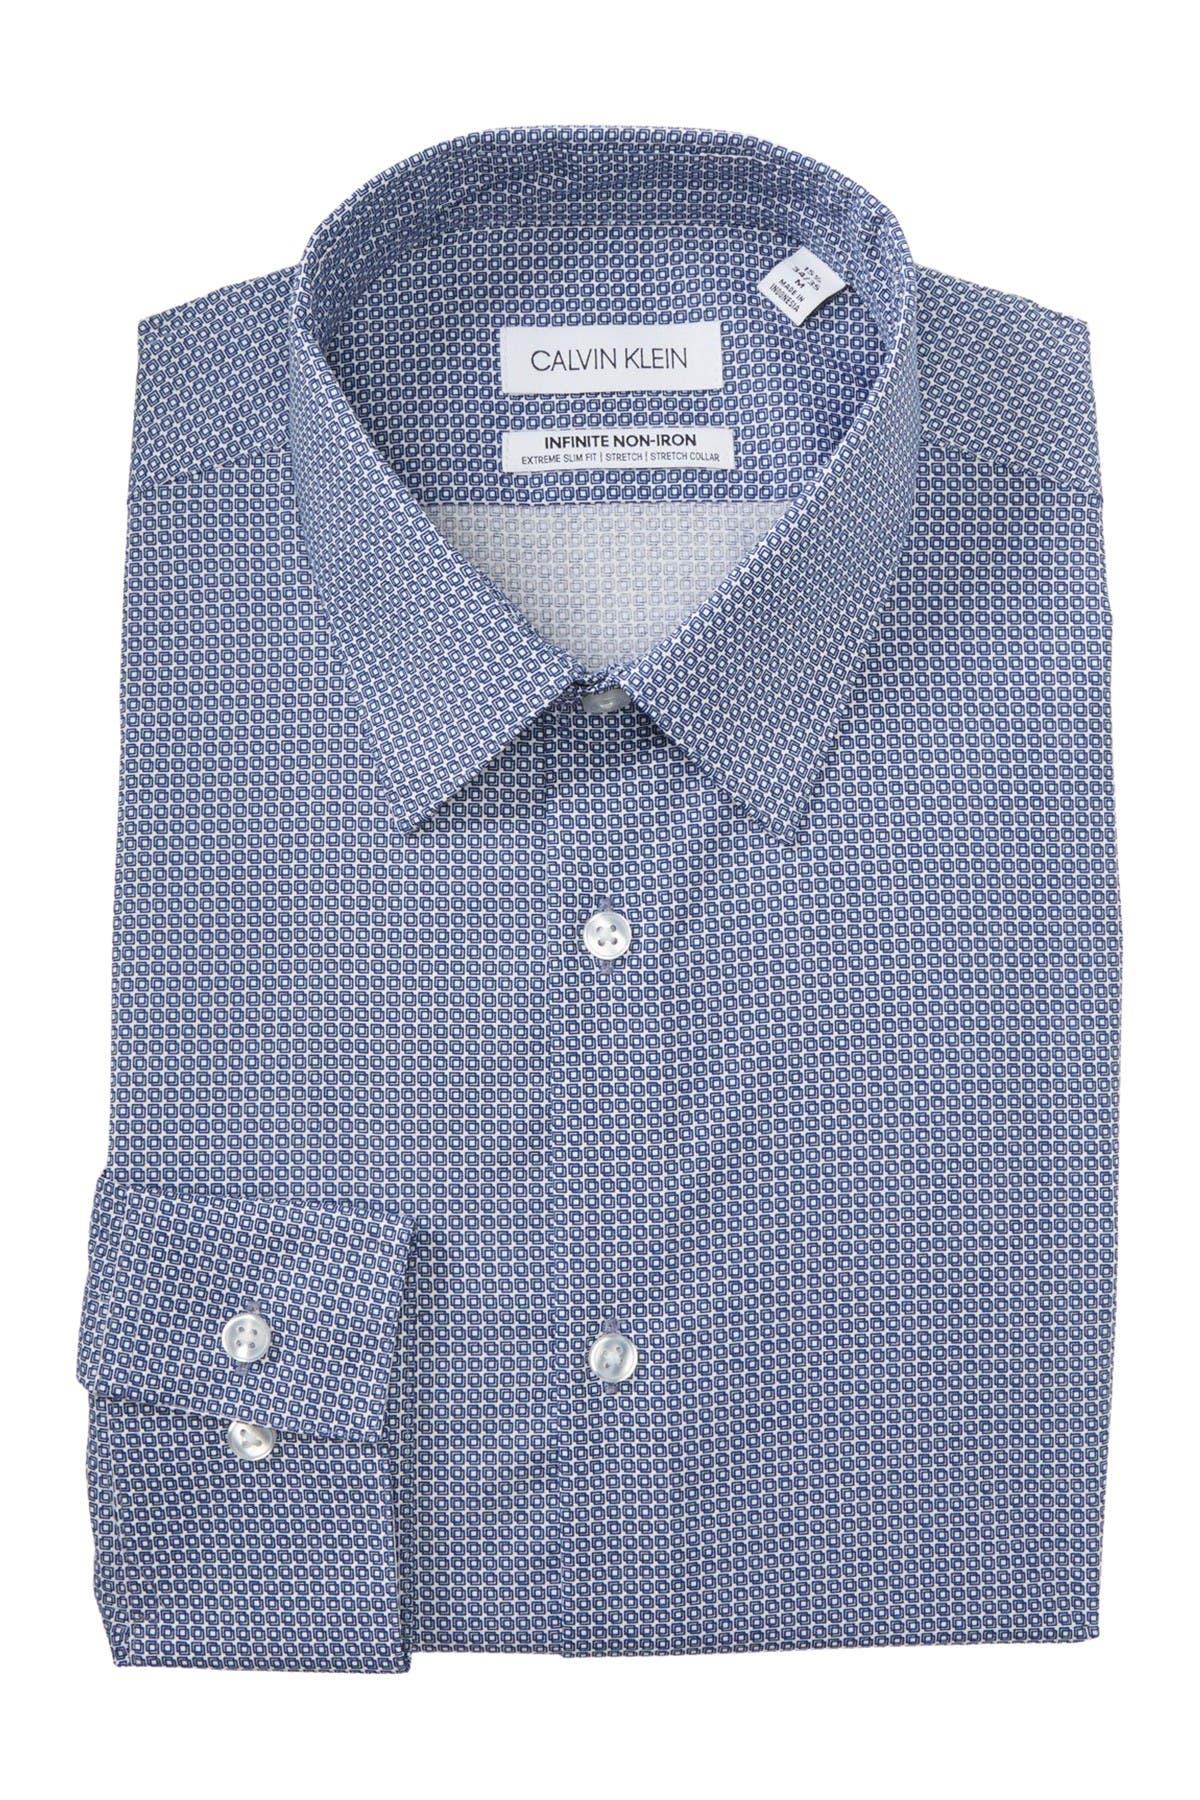 Image of Calvin Klein Geo Extreme Slim Fit Dress Shirt